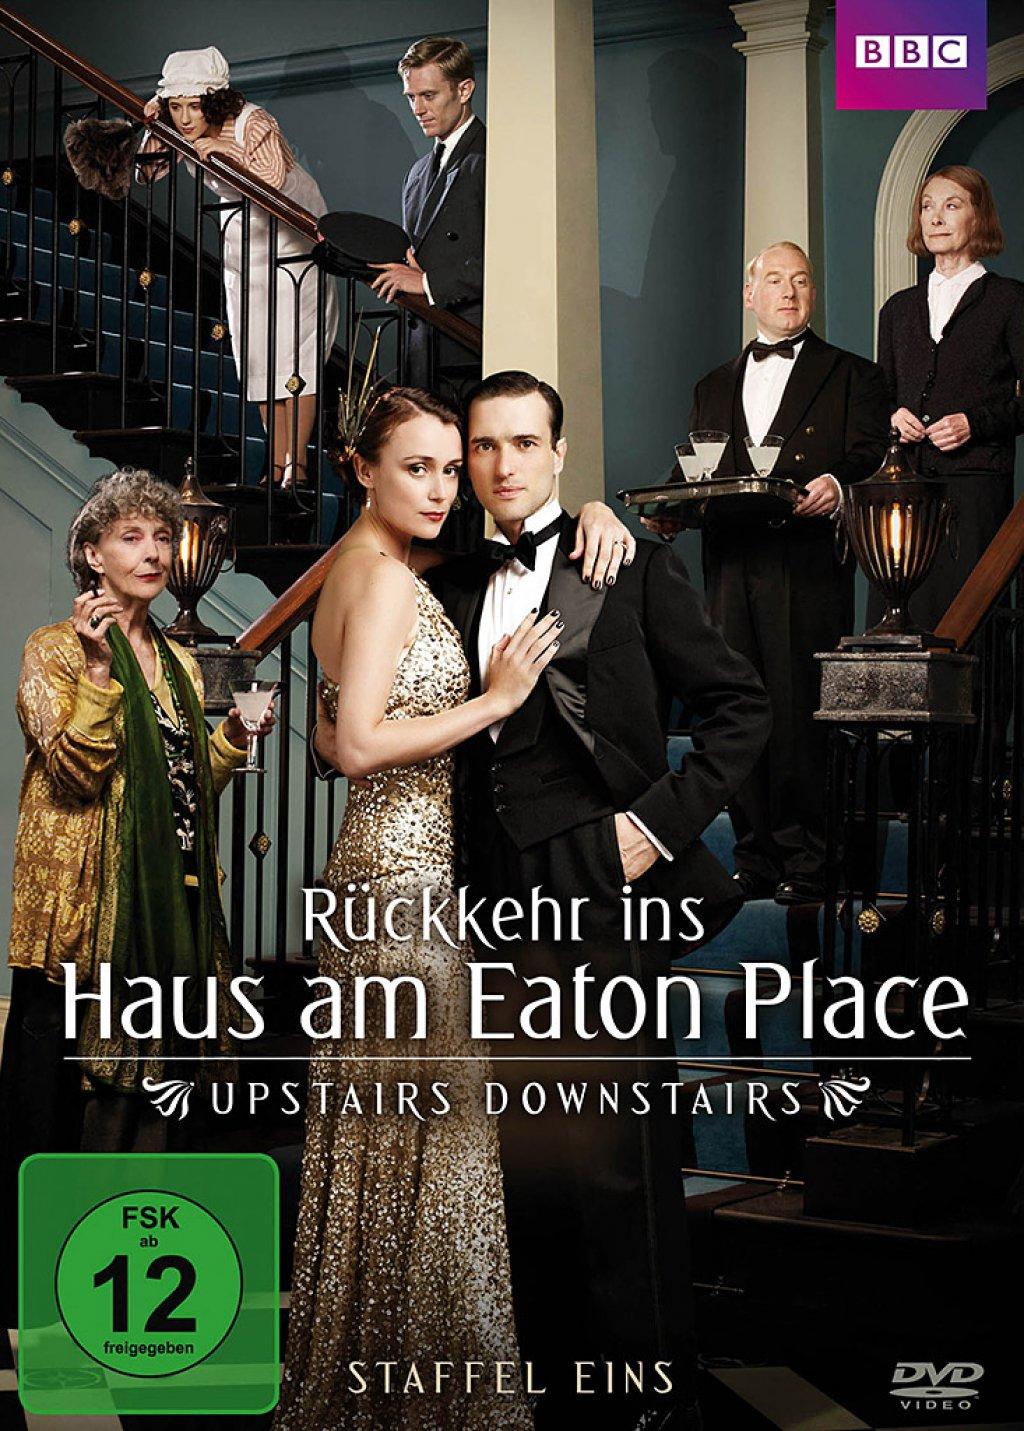 Rückkehr ins Haus am Eaton Place - Staffel 01 (DVD)